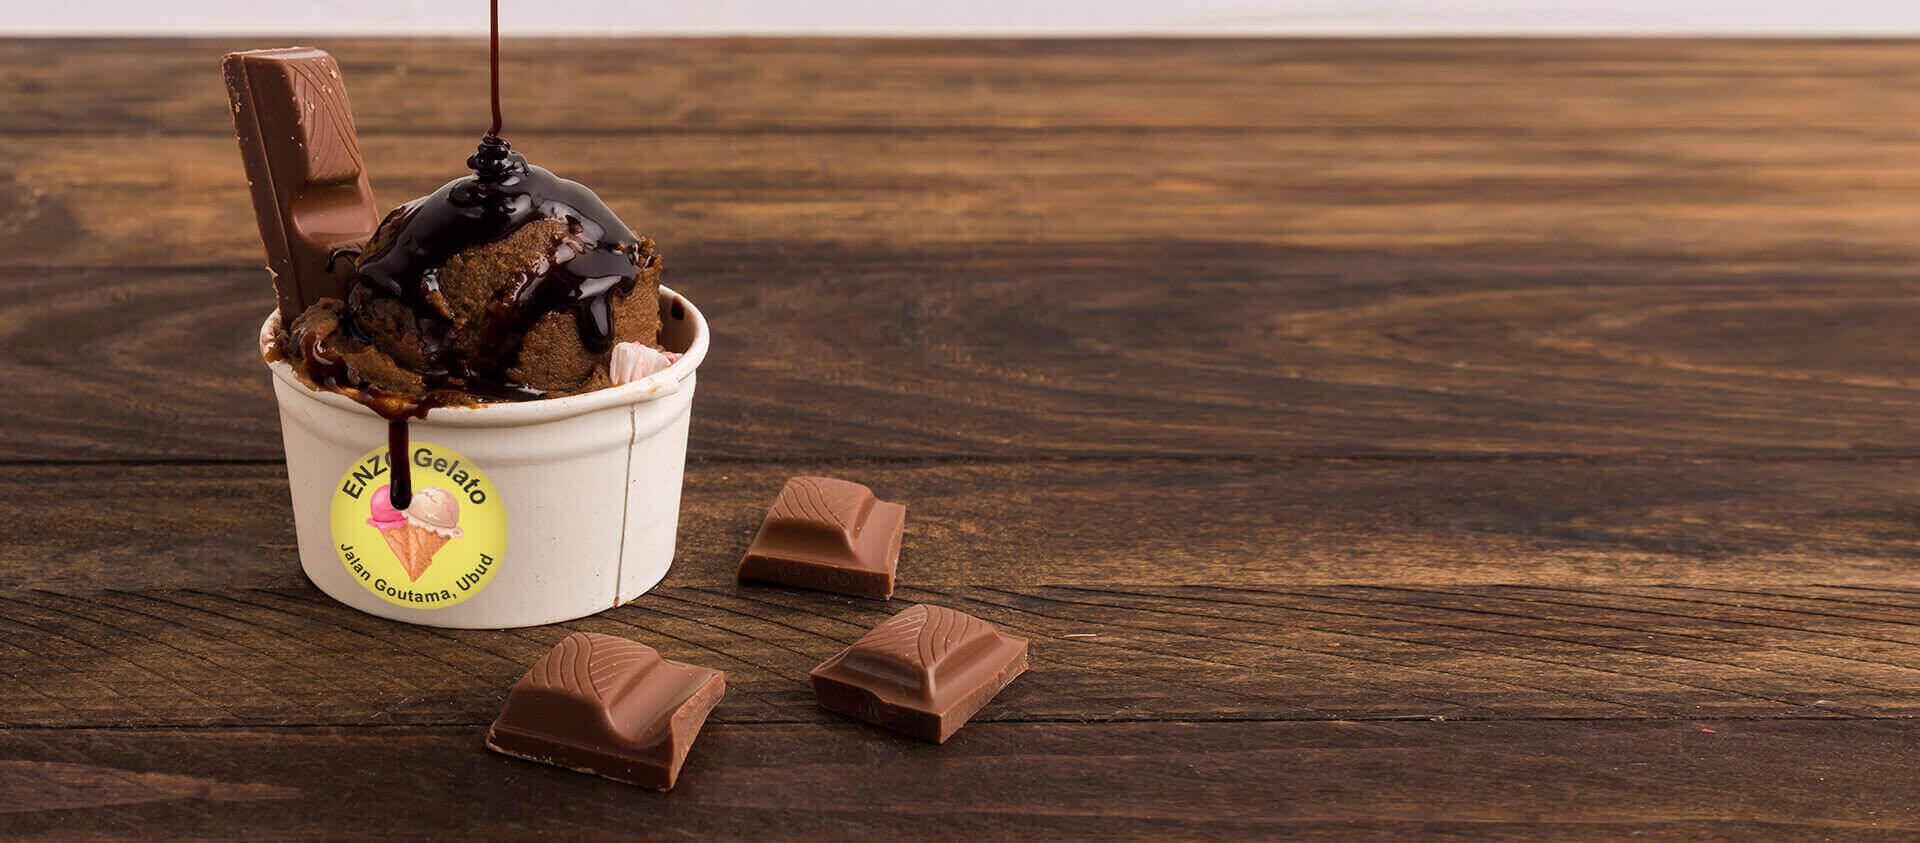 ENZO Gelato - Chocolate Gelato